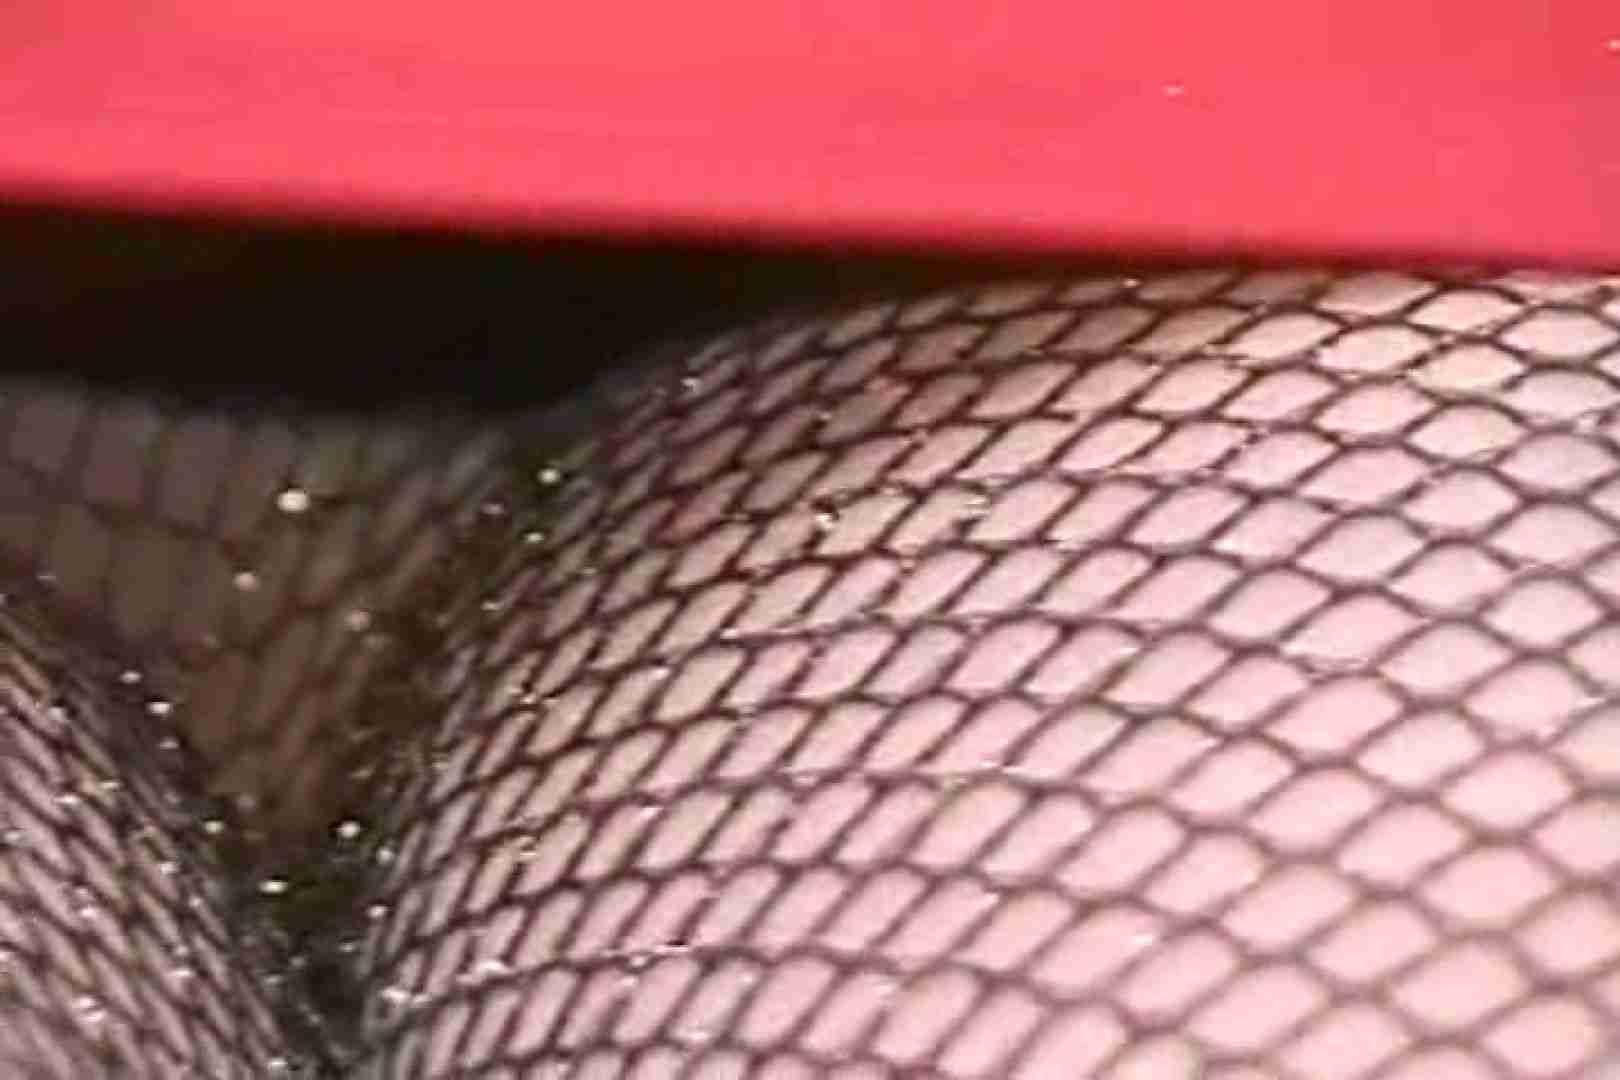 RQカメラ地獄Vol.20 現役ギャル AV無料動画キャプチャ 98pic 14